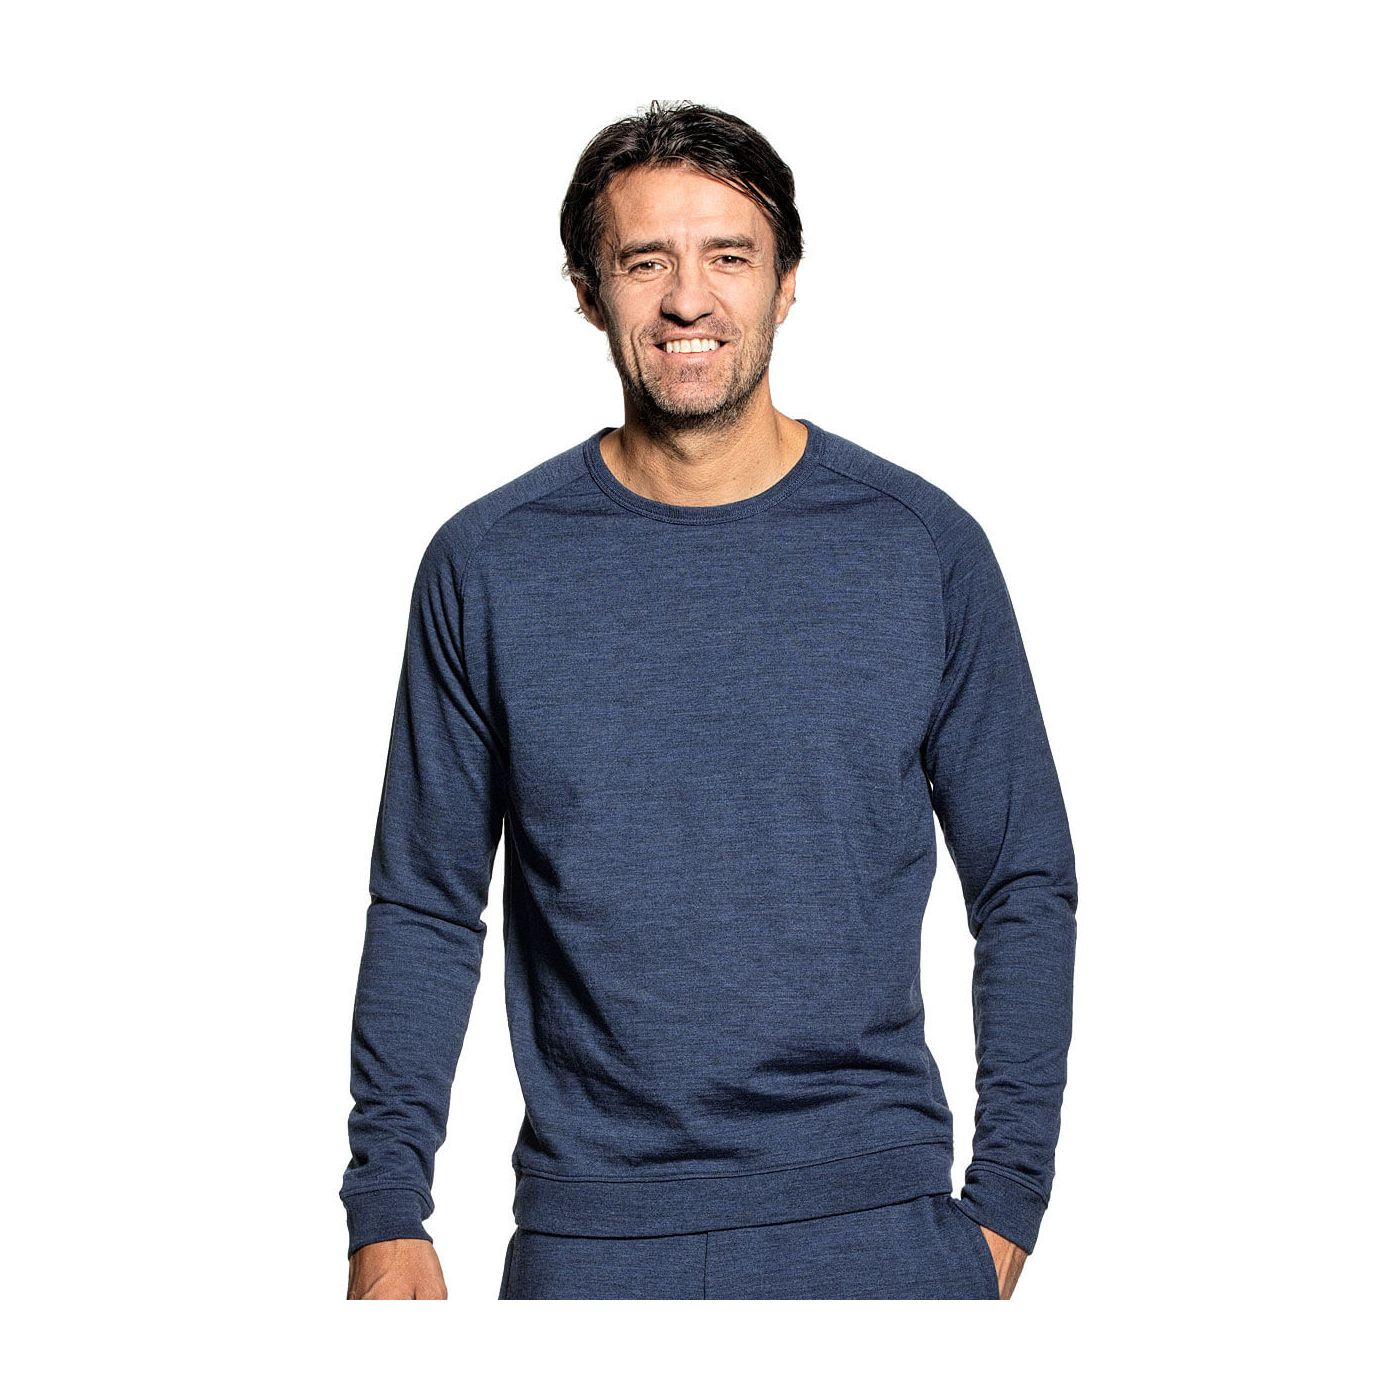 Sweatshirt for men made of Merino wool in Blue